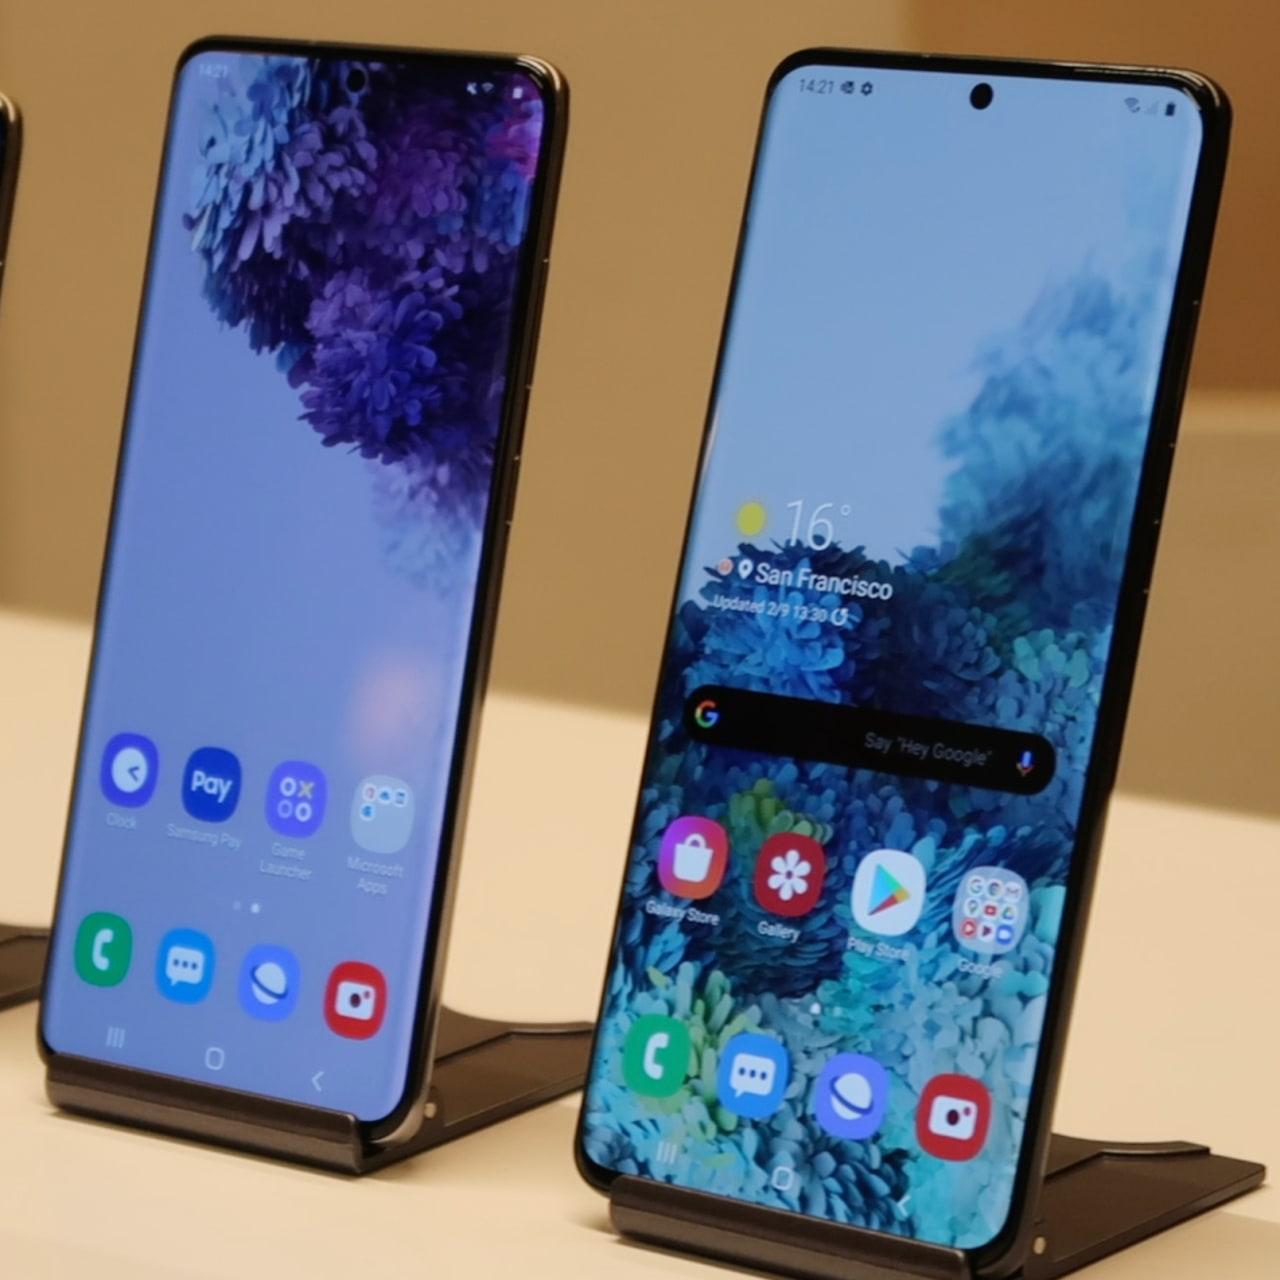 SQR - Samsung Galaxy S20, Galaxy S20 Plus